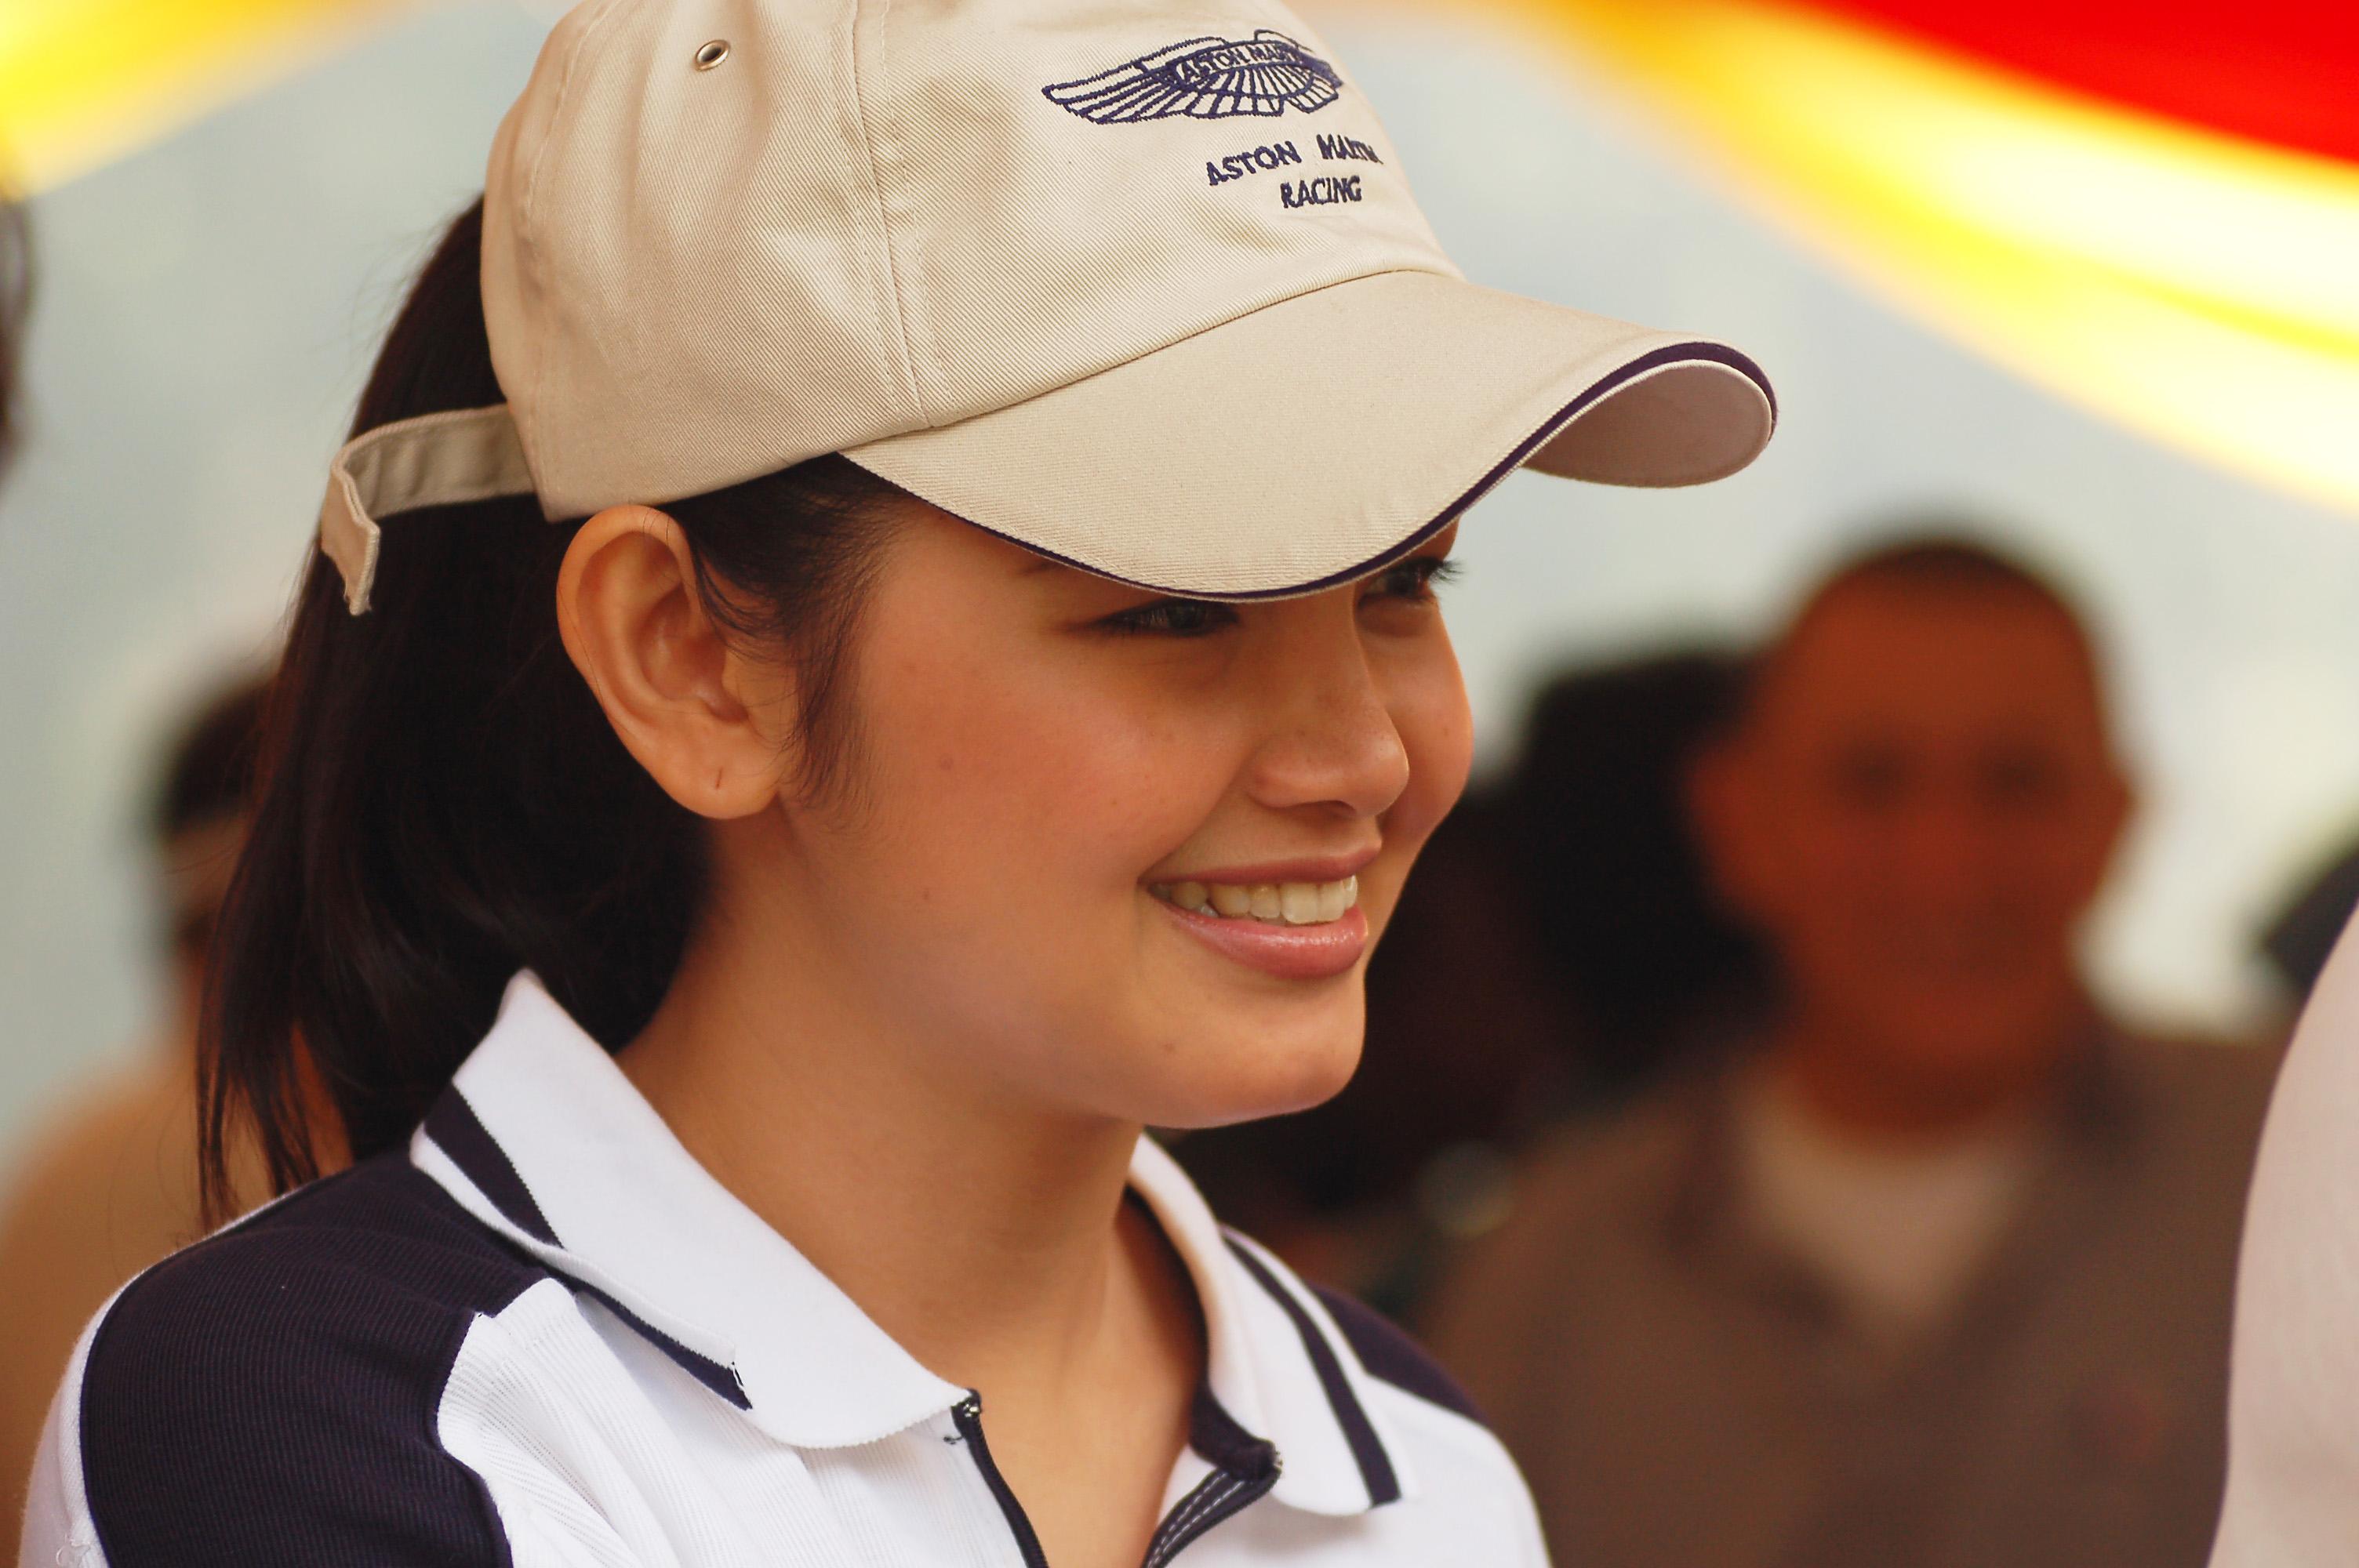 Top Picks Best Of Siti Nurhaliza Worldnewscom Tendencies Caps Black Way Life Cap Hitam Philanthropylink